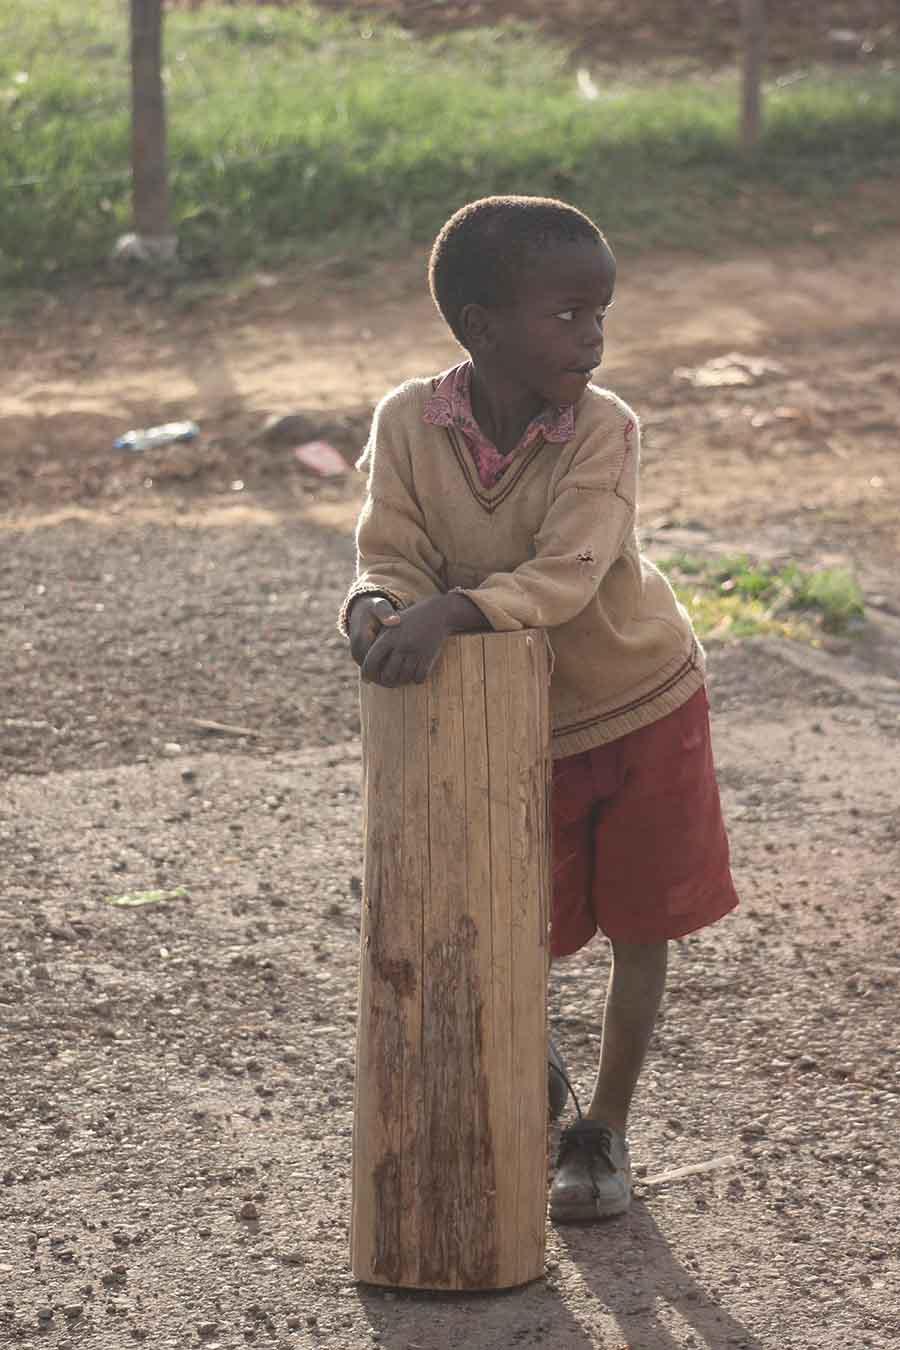 Roadside, Naivasha - Photographs by Gavin Cologne-Brookes